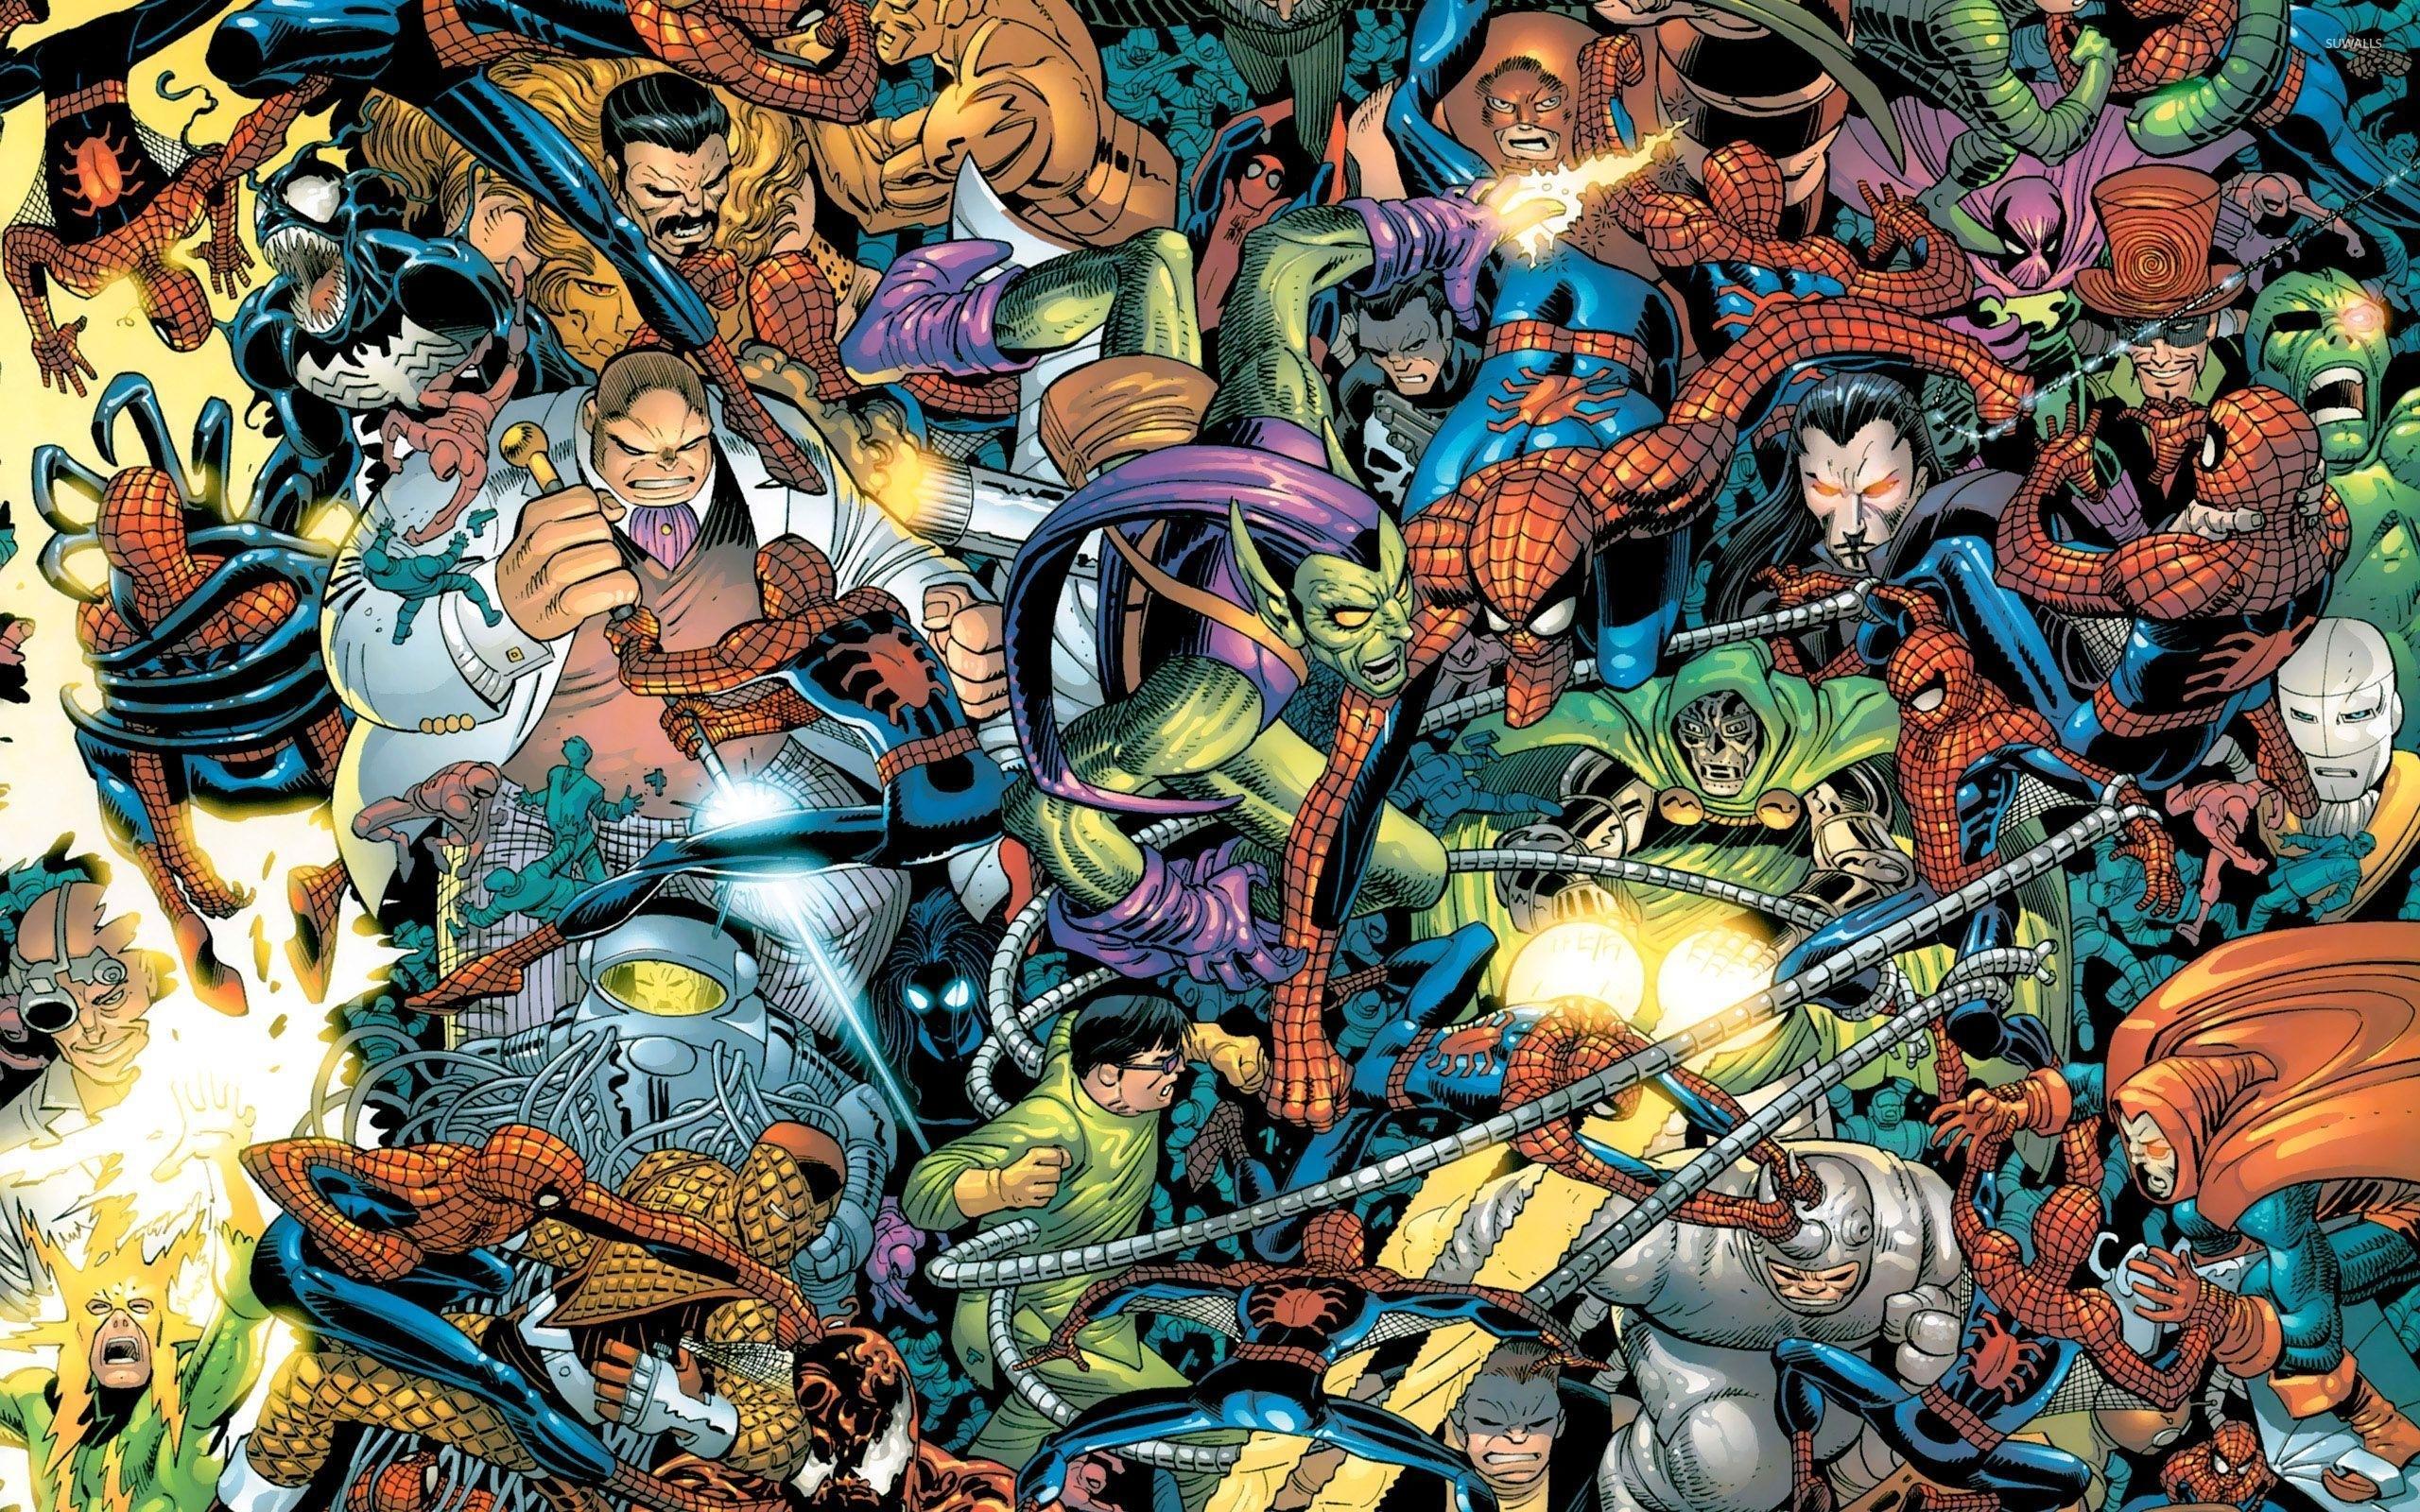 spider-man wallpaper - comic wallpapers - #29881